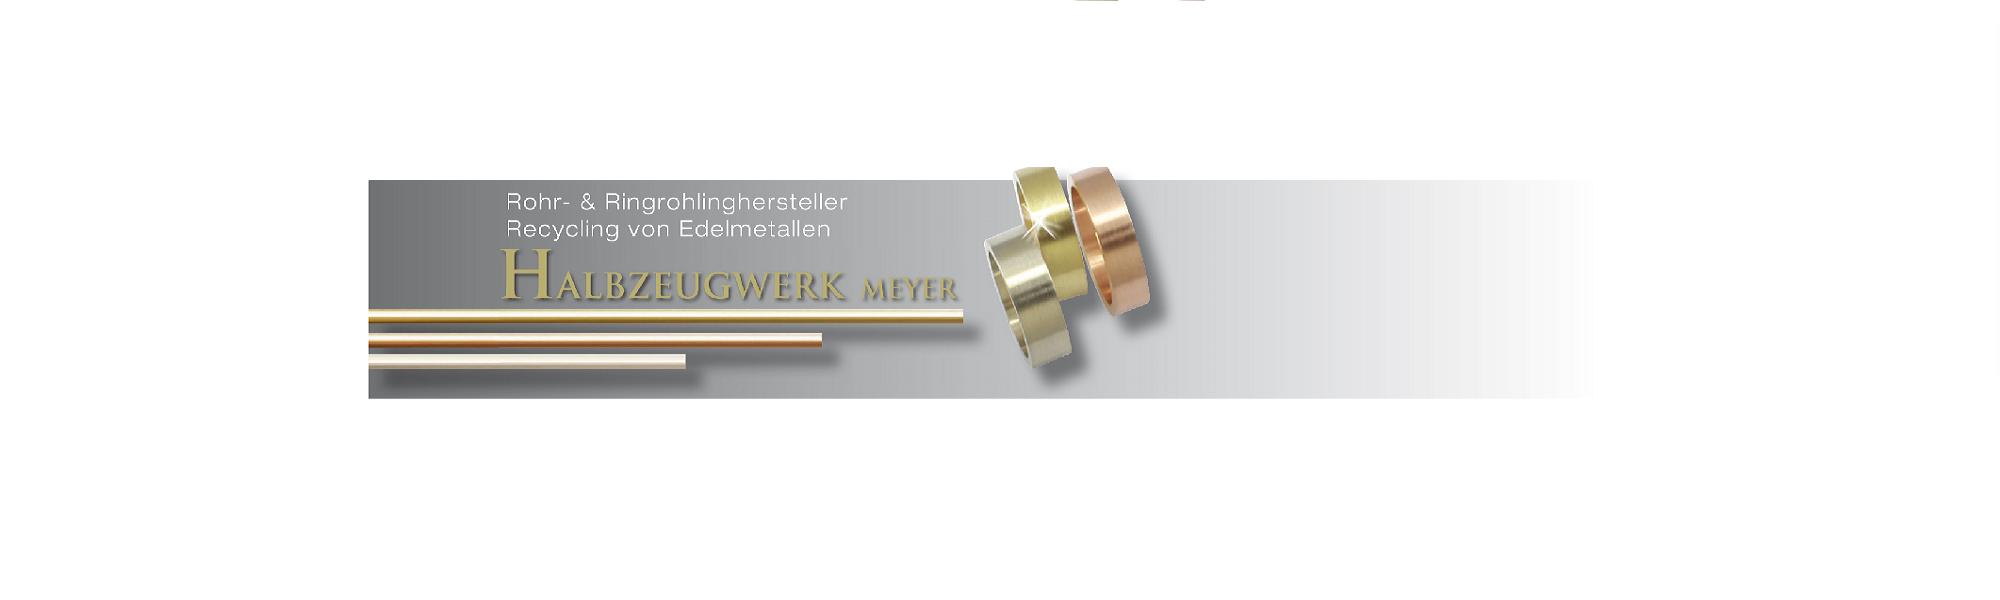 Halbzeugwerk Meyer